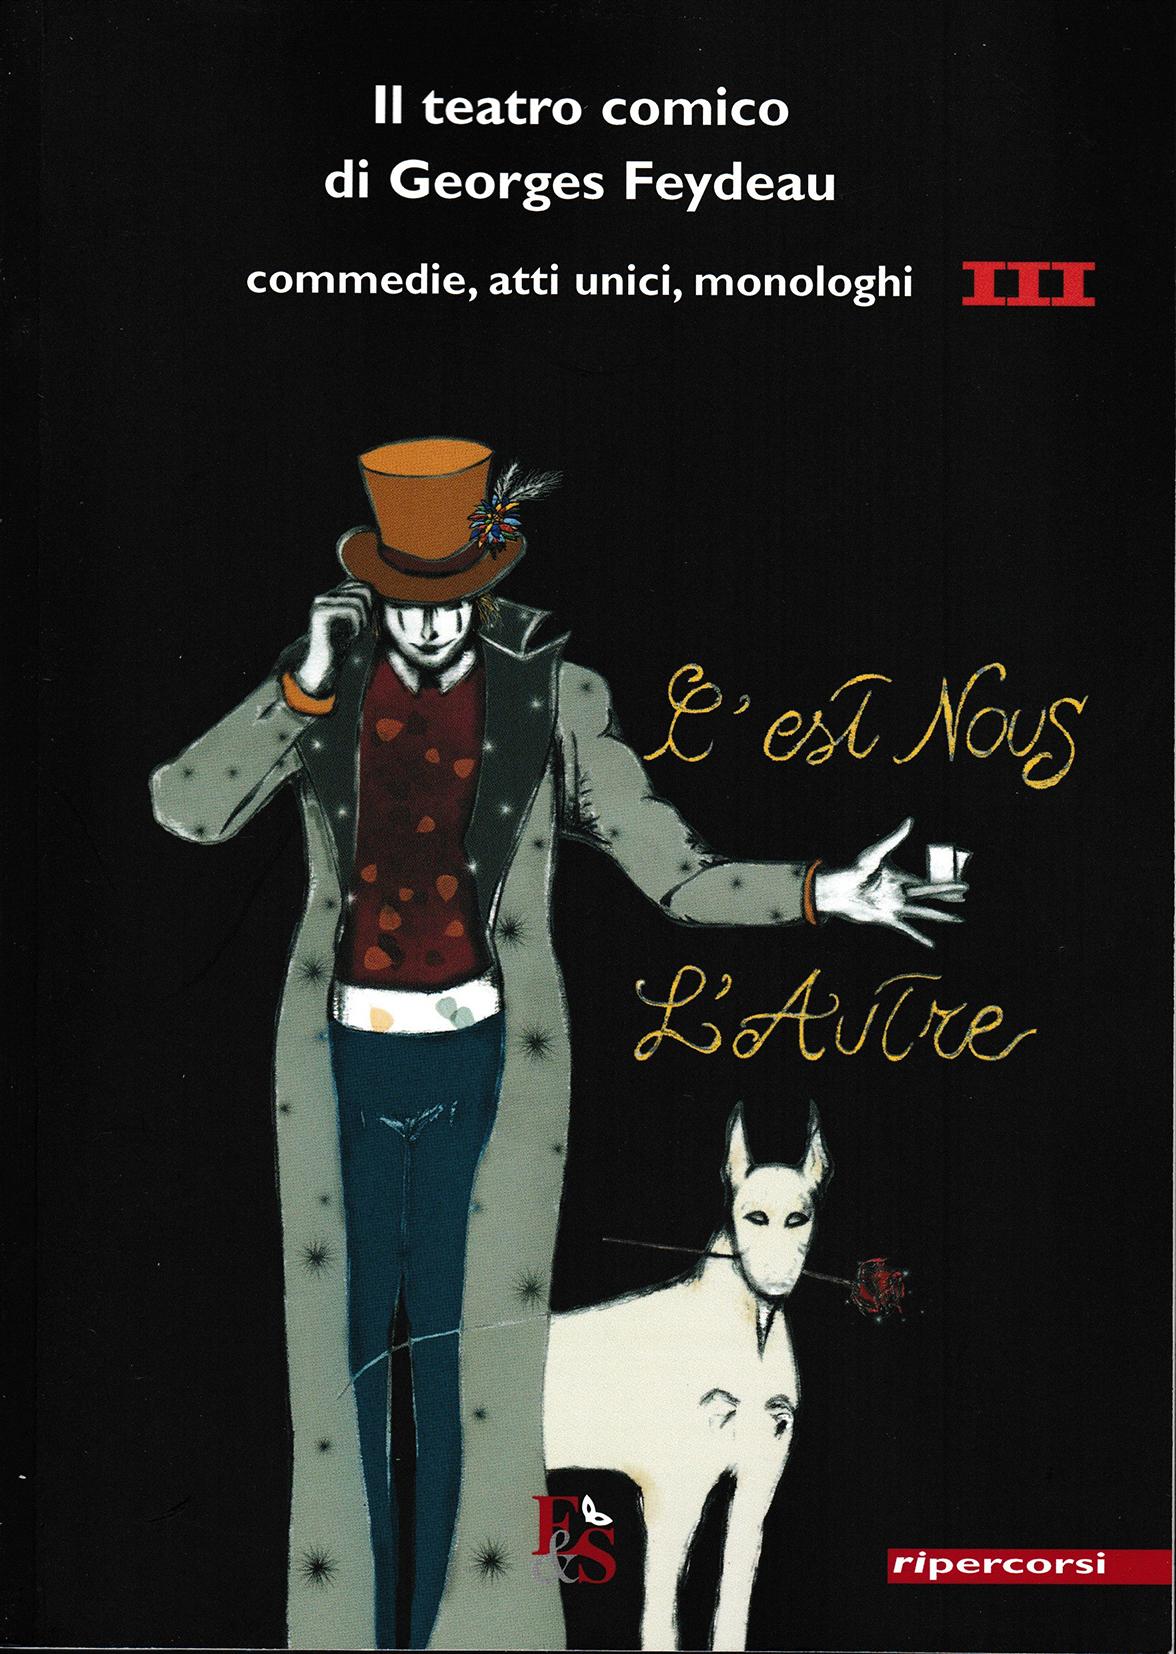 Il teatro comico di Georges Feydeau